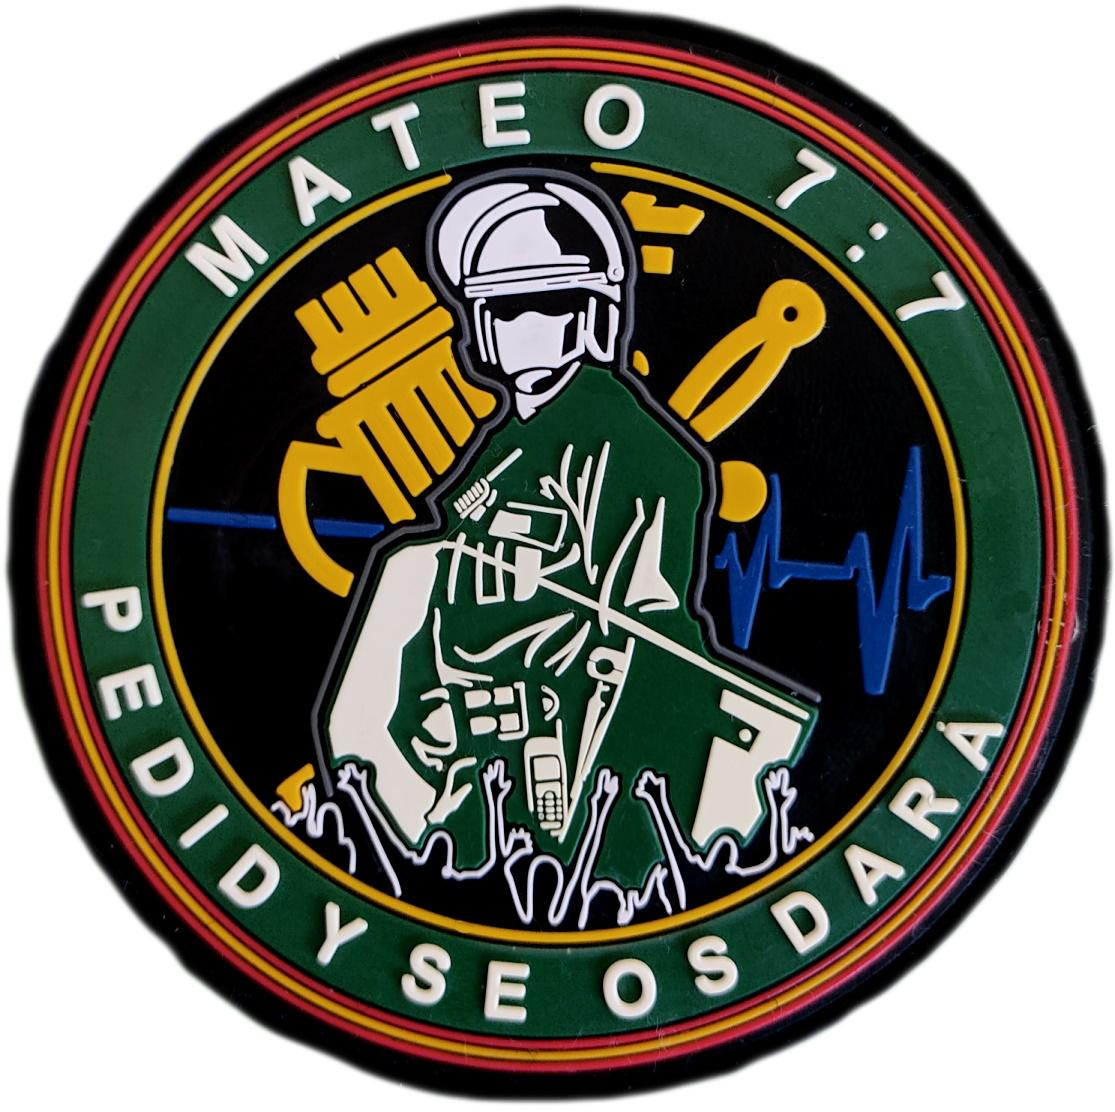 Guardia Civil Mateo 7:7 pedid y se os dará parche insignia emblema distintivo